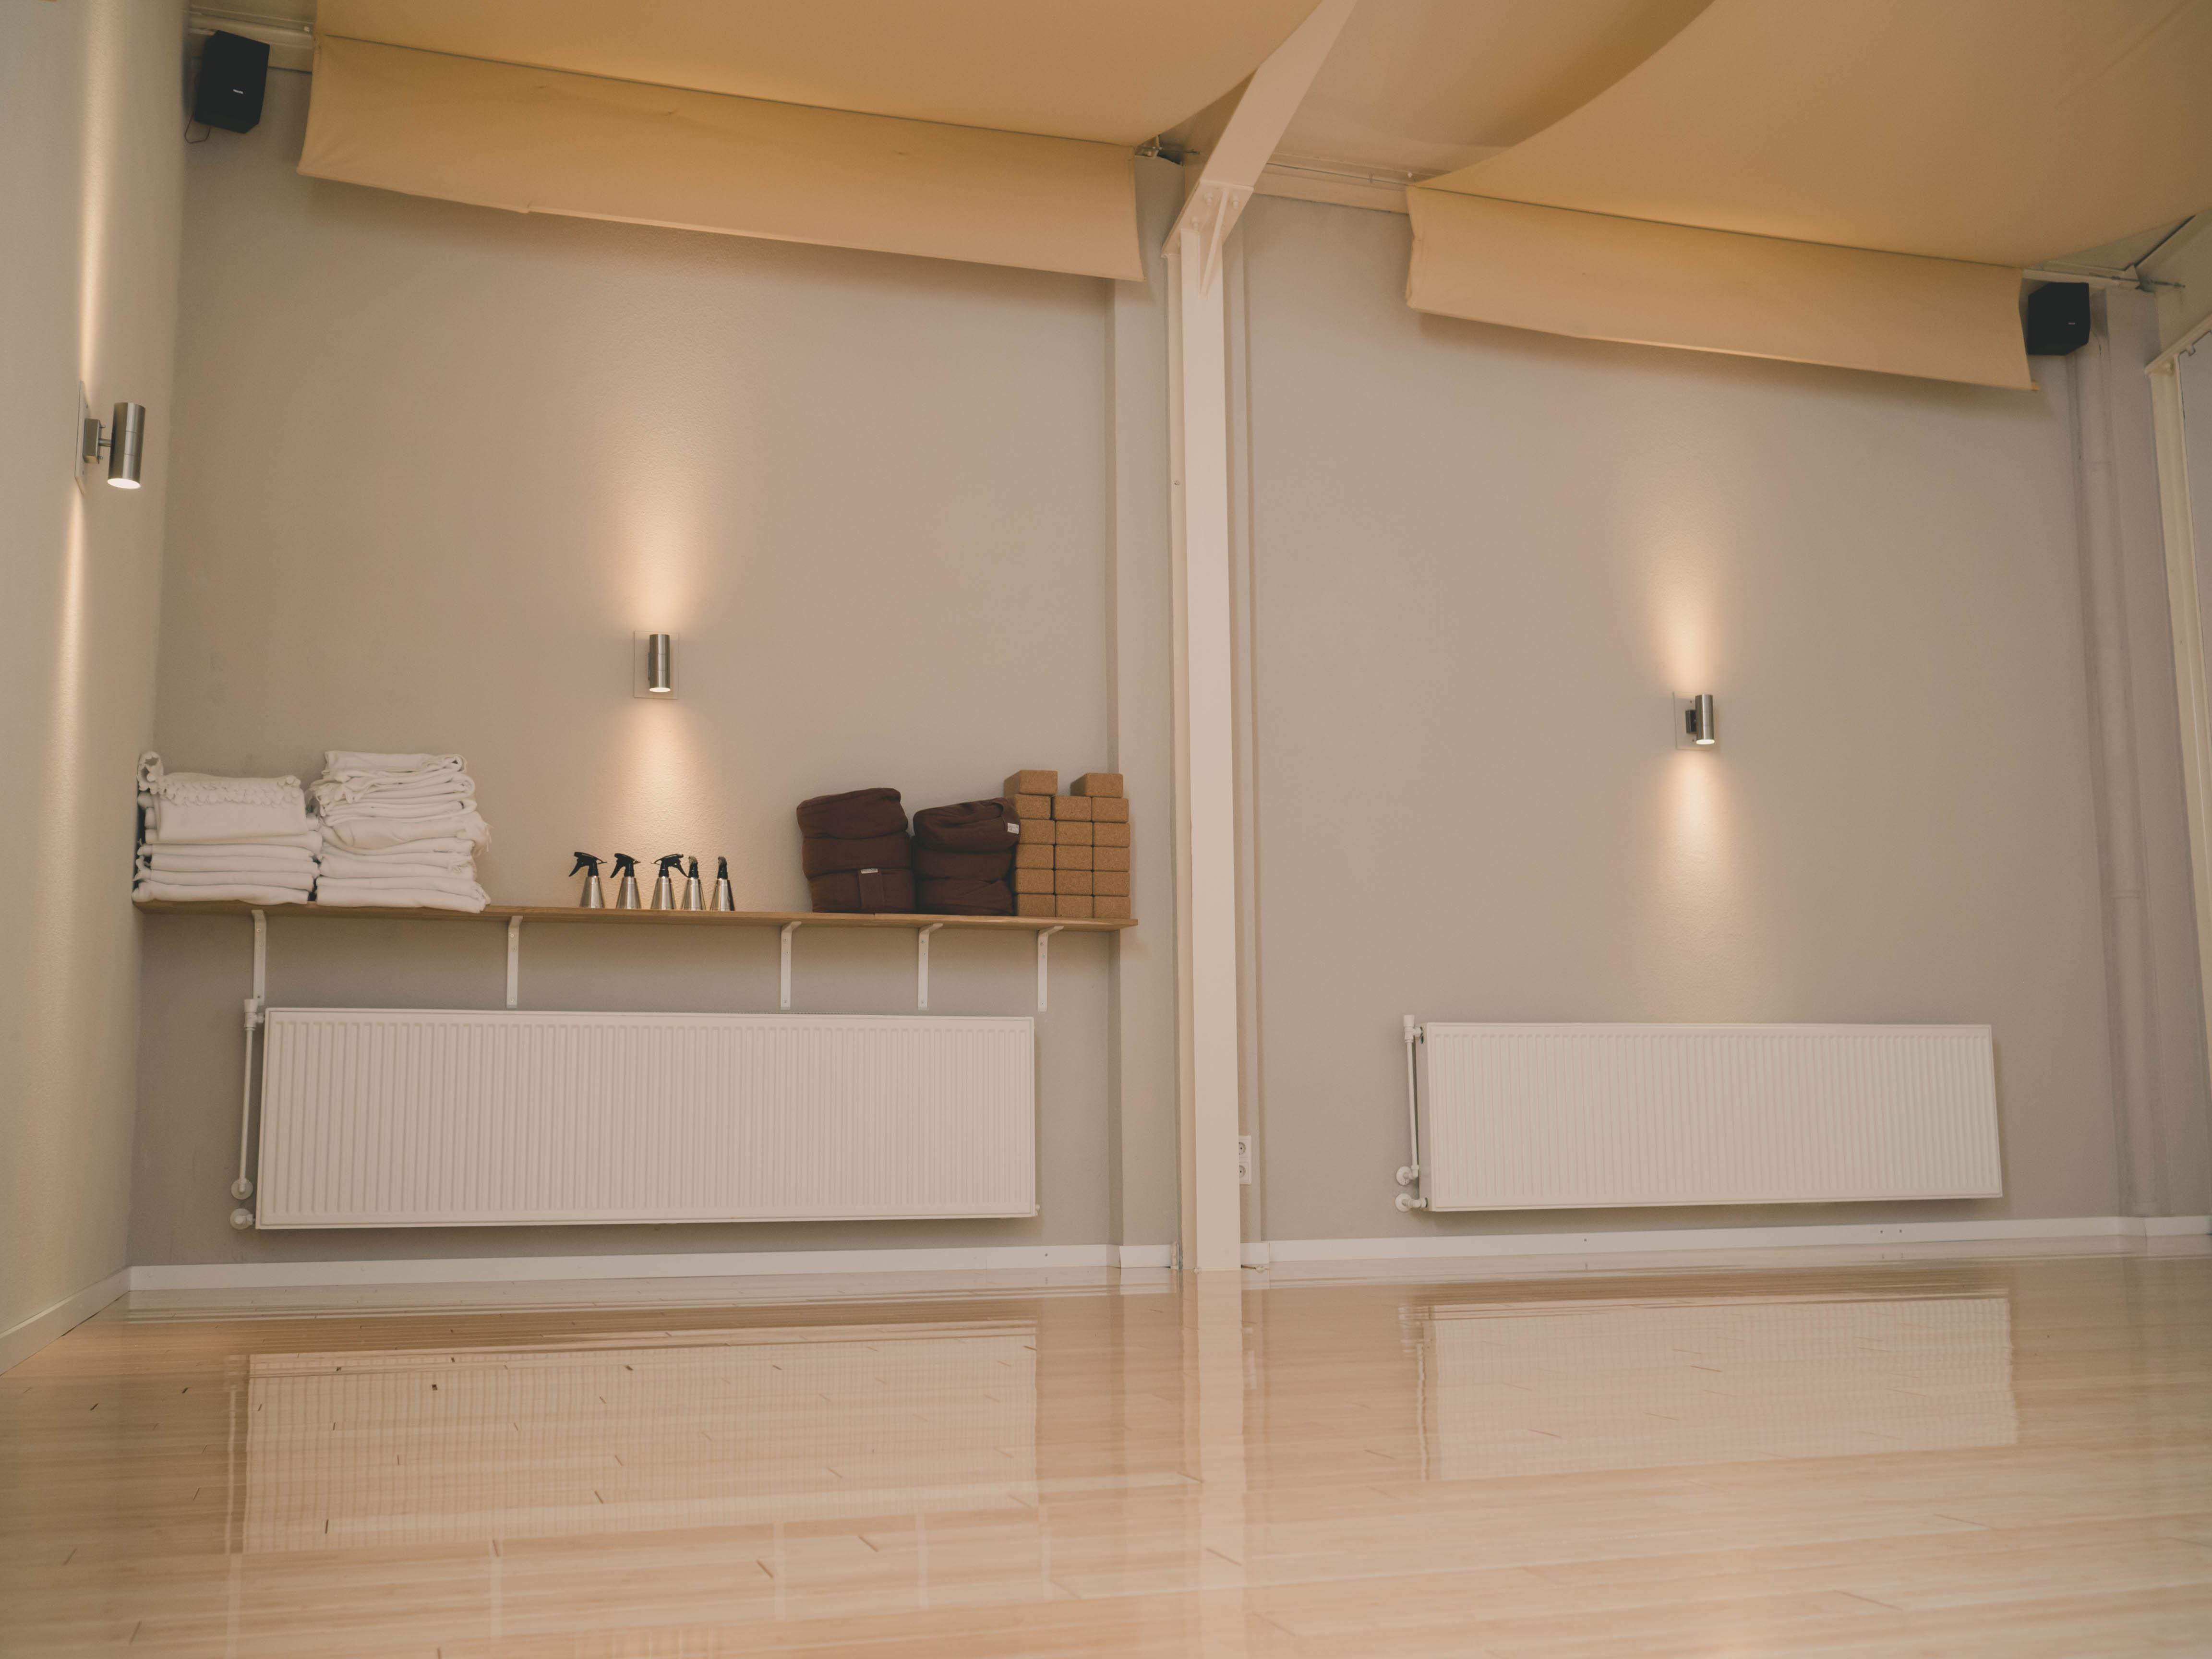 Kleine studio, meditatiekussens